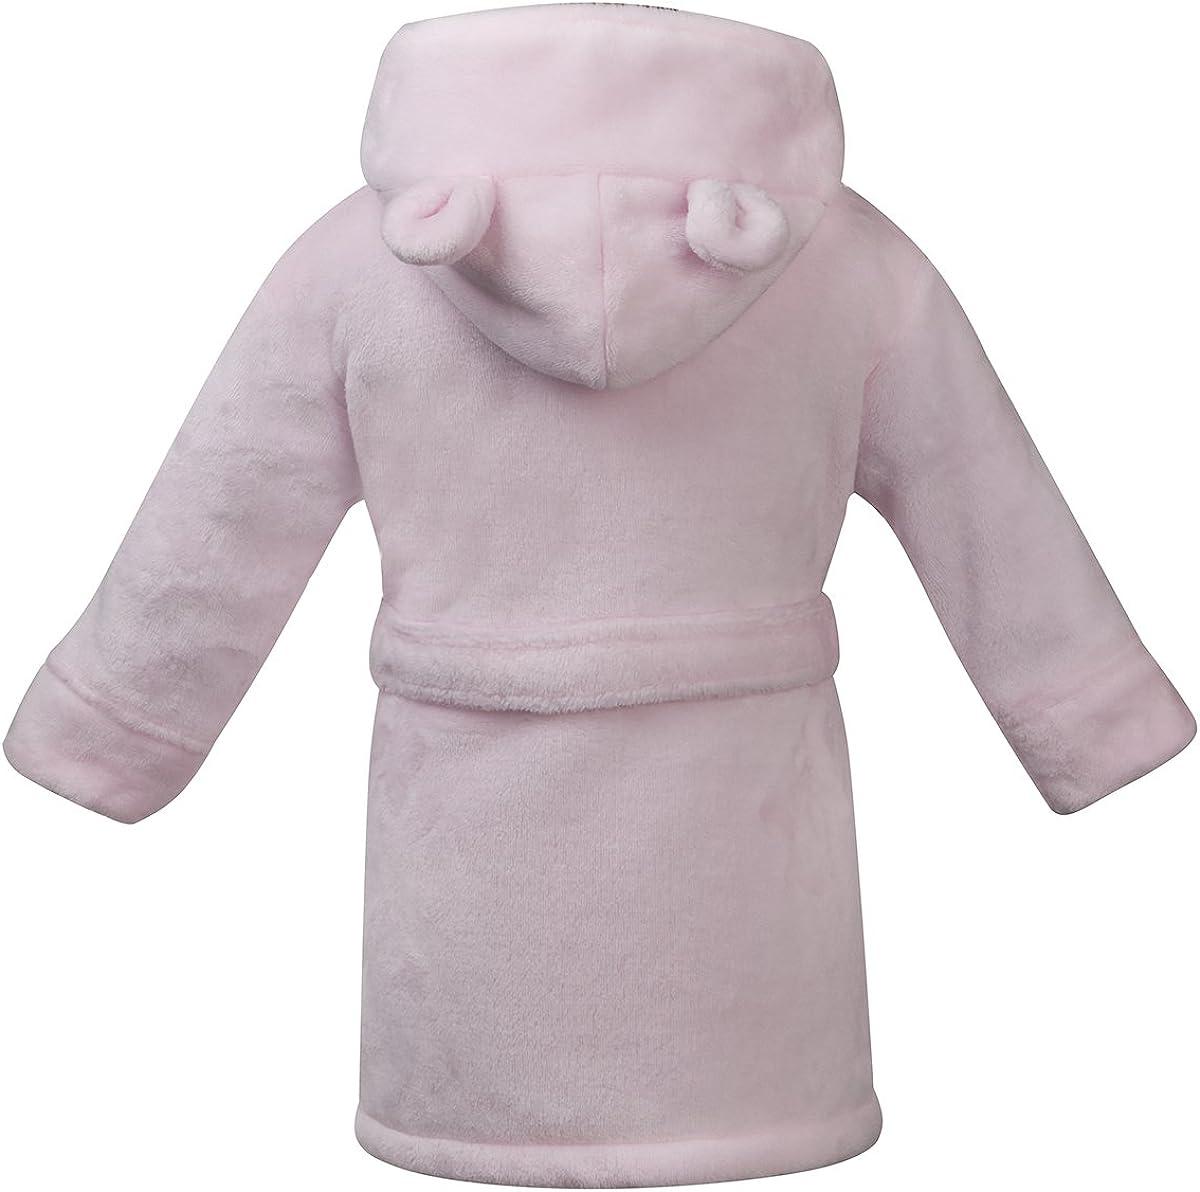 Babytown Baby Girls Velvety Soft Hooded Dressing Gown Pink